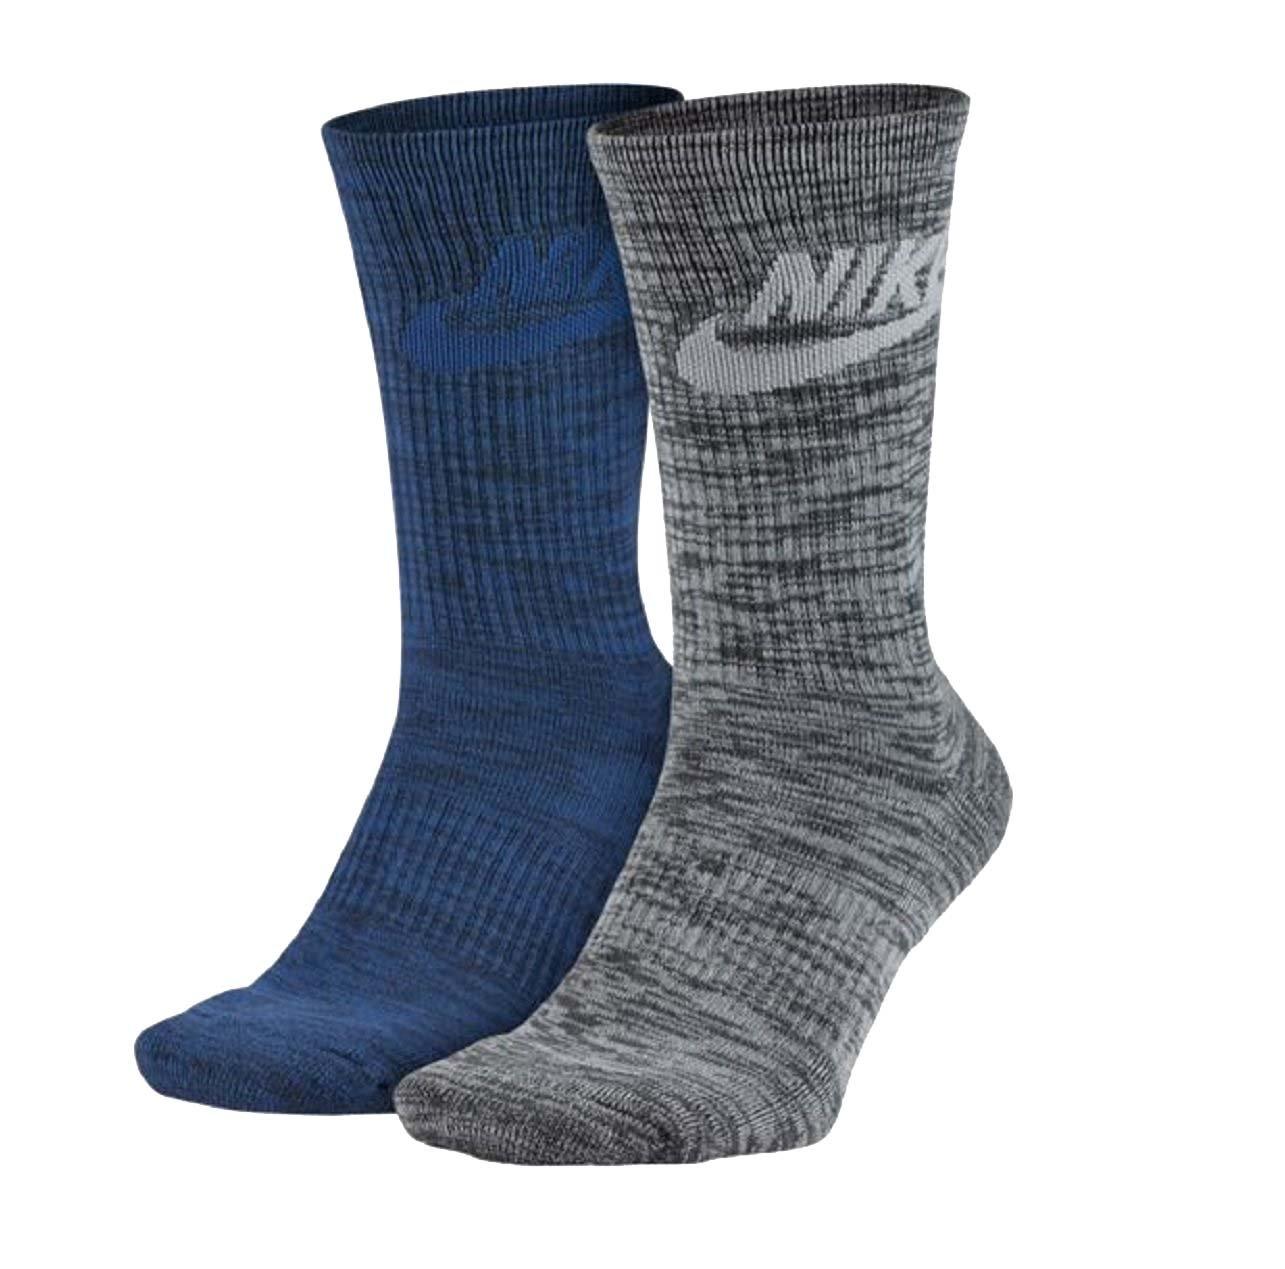 Mens Nike Sportswear Advance Crew Socks - 2 Pair